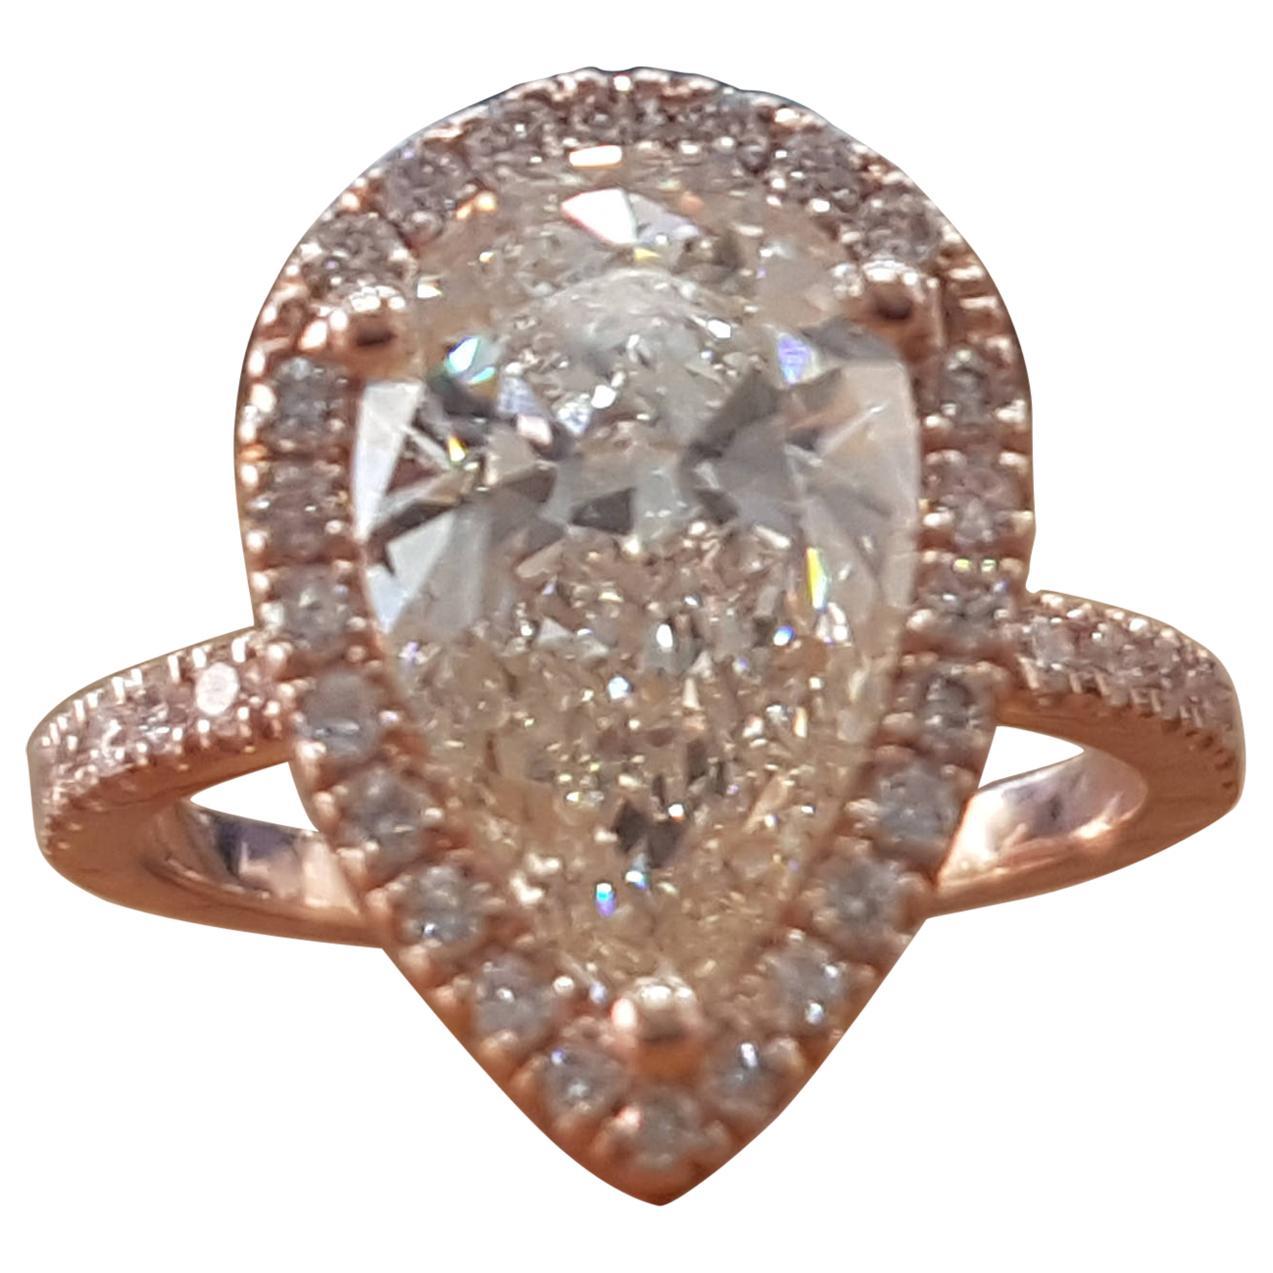 1 1/2 Carat 14 Karat Rose Gold Pear Diamond Engagement Ring, Tear Drop Diamond